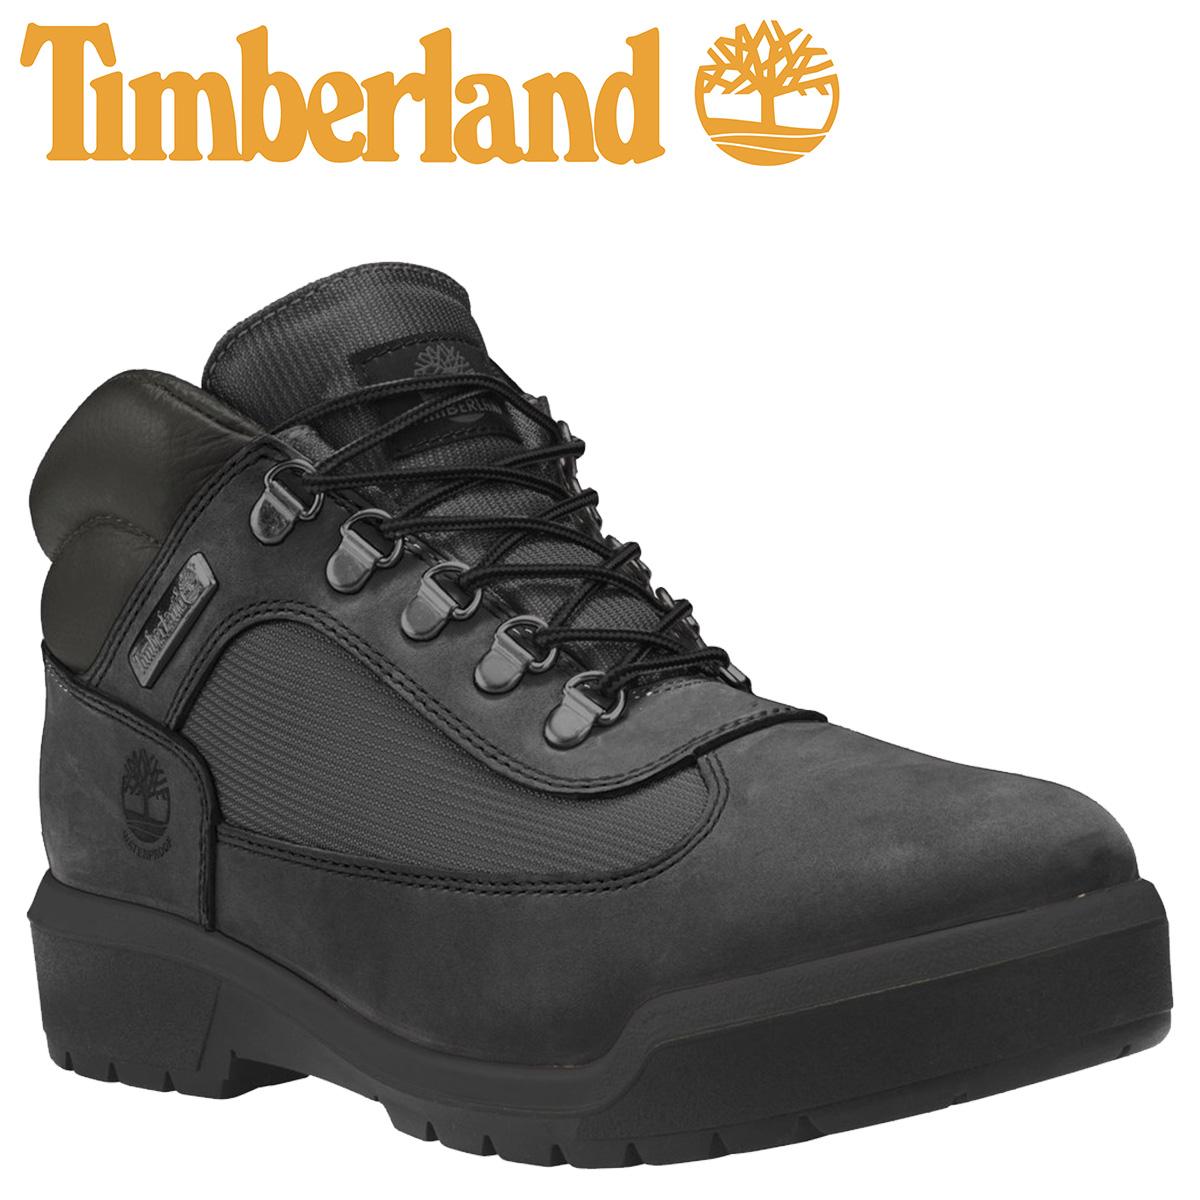 Timberland WATERPROOF FIELD BOOTS F/L ティンバーランド ブーツ メンズ A1A12 Dワイズ ブラック [8/29 追加入荷]